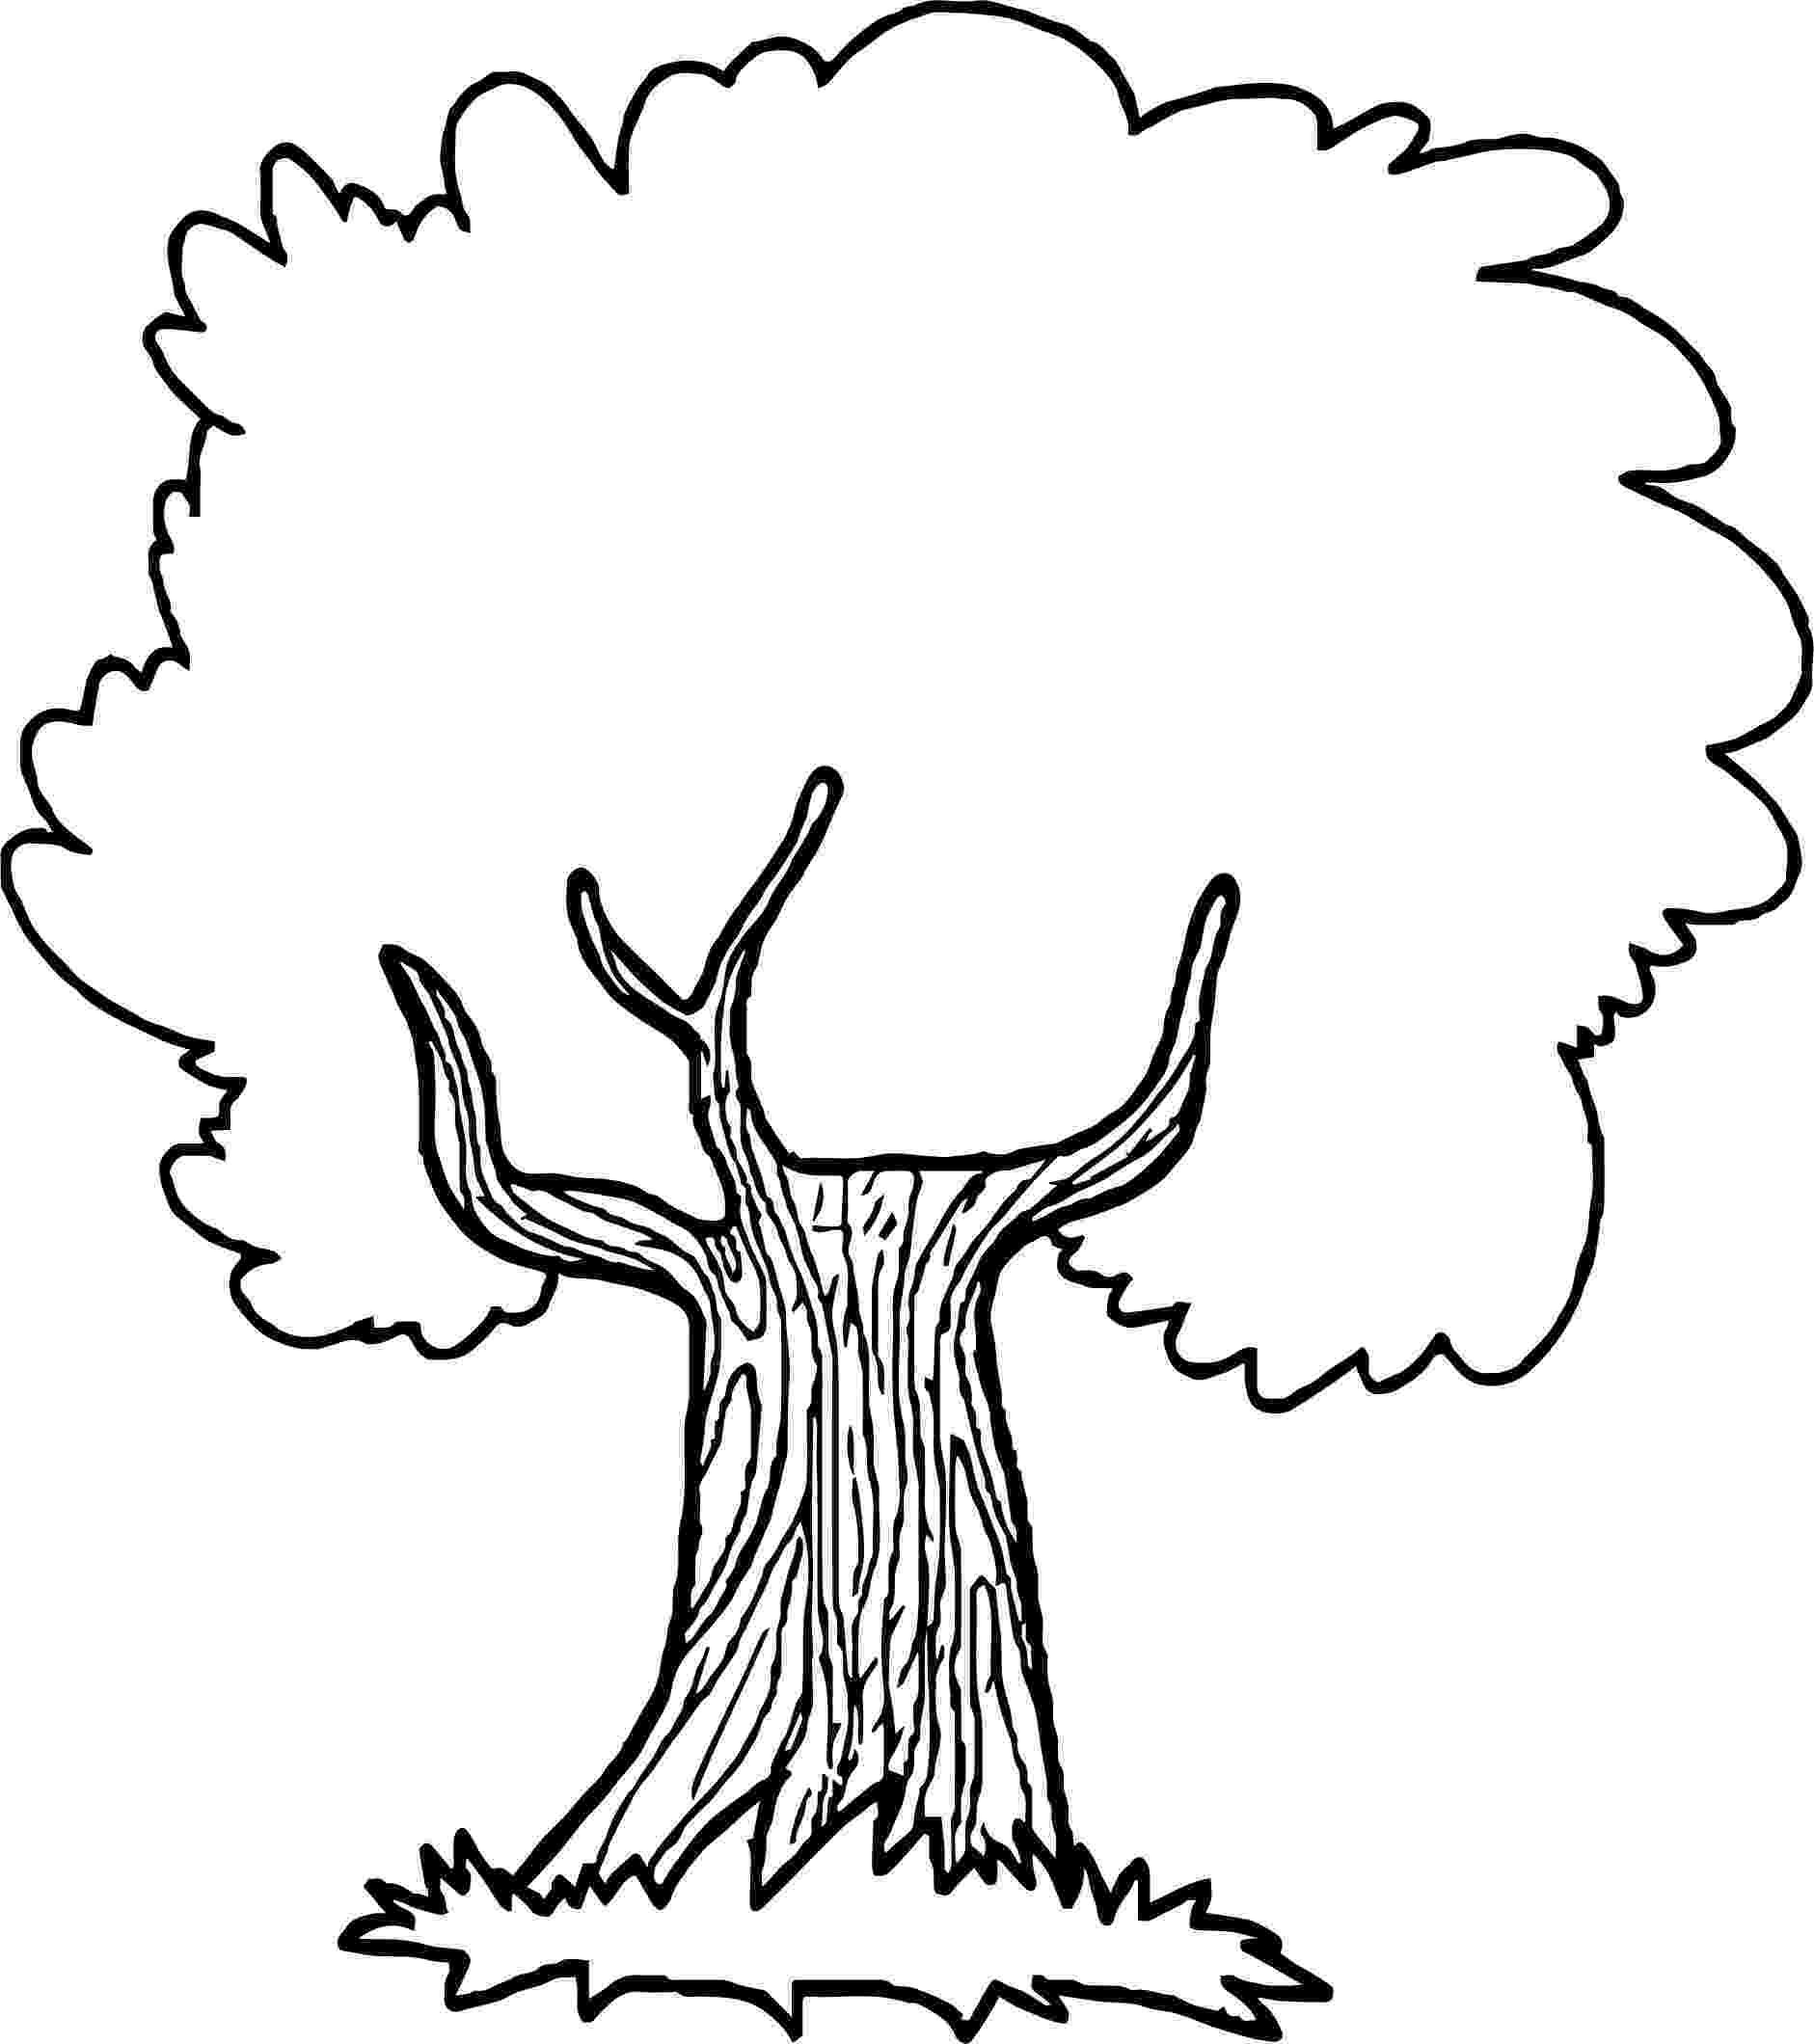 printable tree coloring page free printable tree coloring pages for kids page coloring tree printable